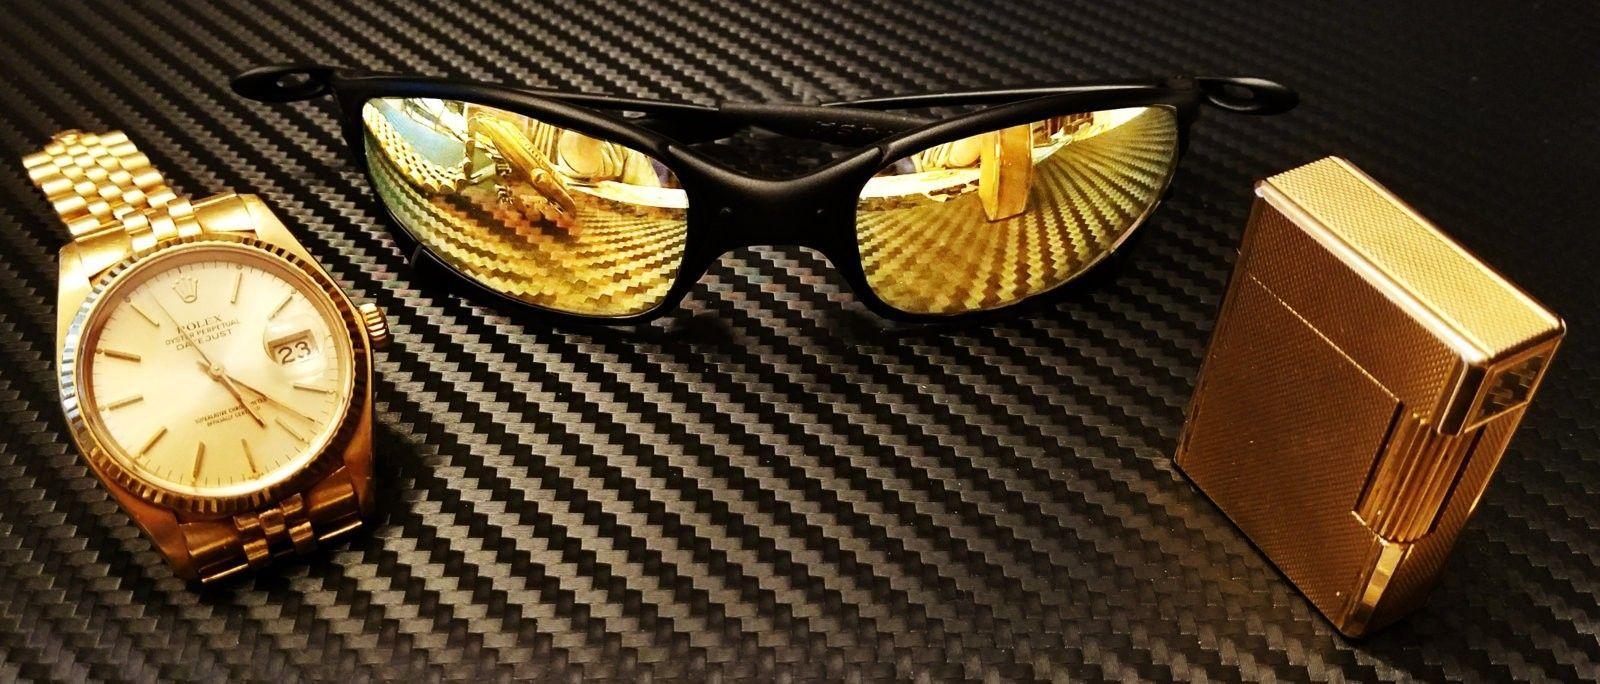 GOLD! 24K Juliet X-MAN/HARDAWAY Collaboration... - gold3.jpg